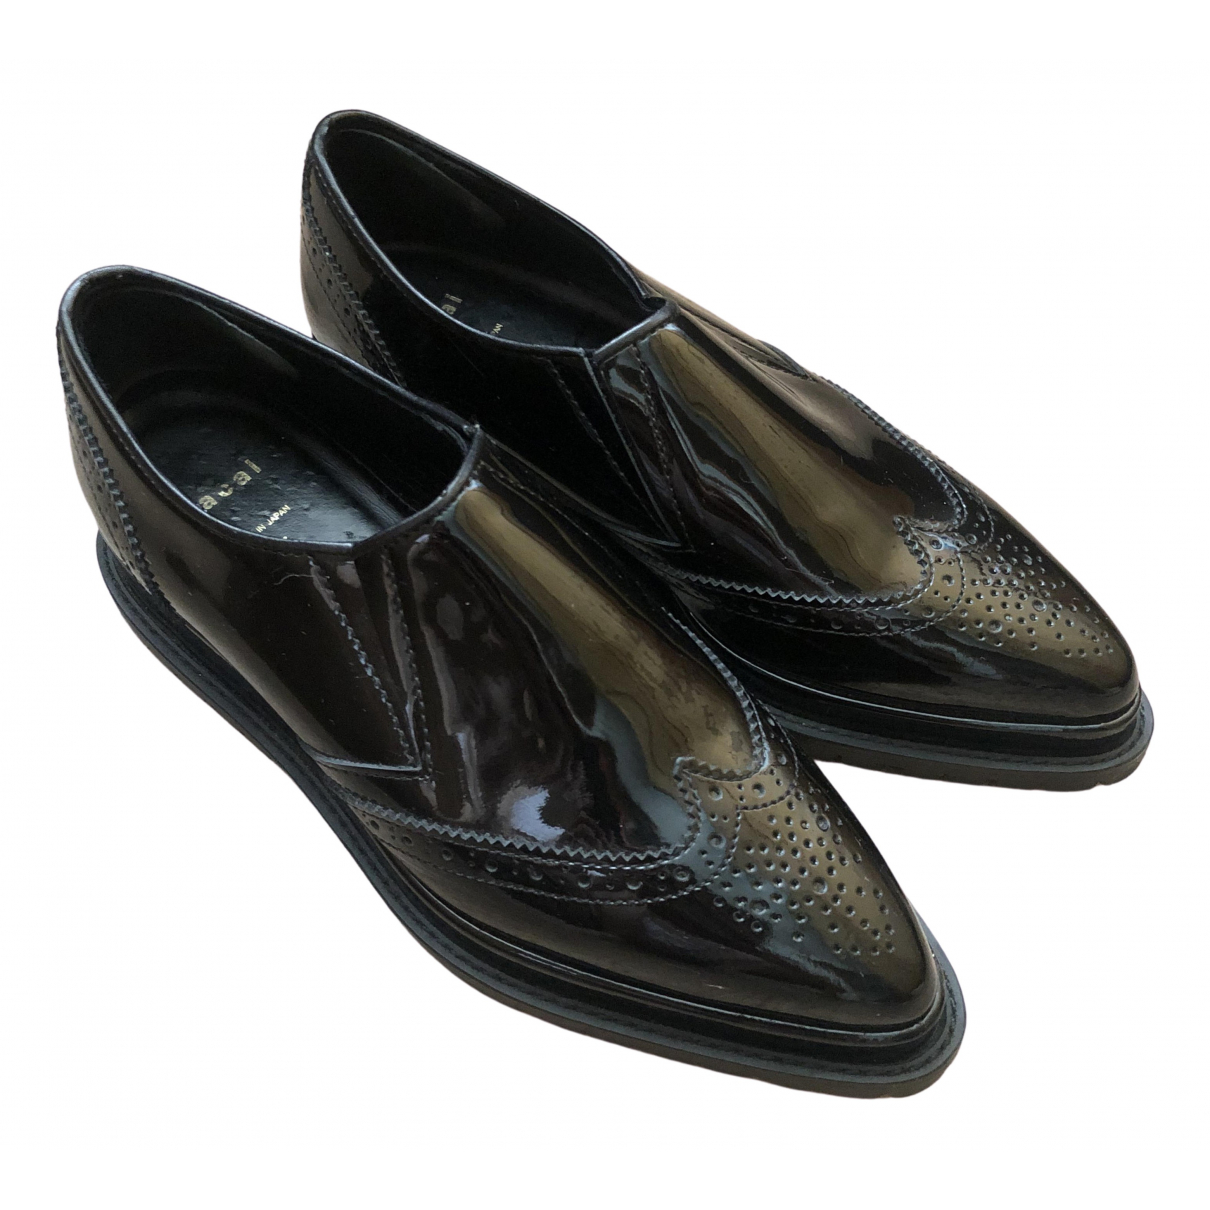 Sacai \N Black Patent leather Flats for Women 37 EU